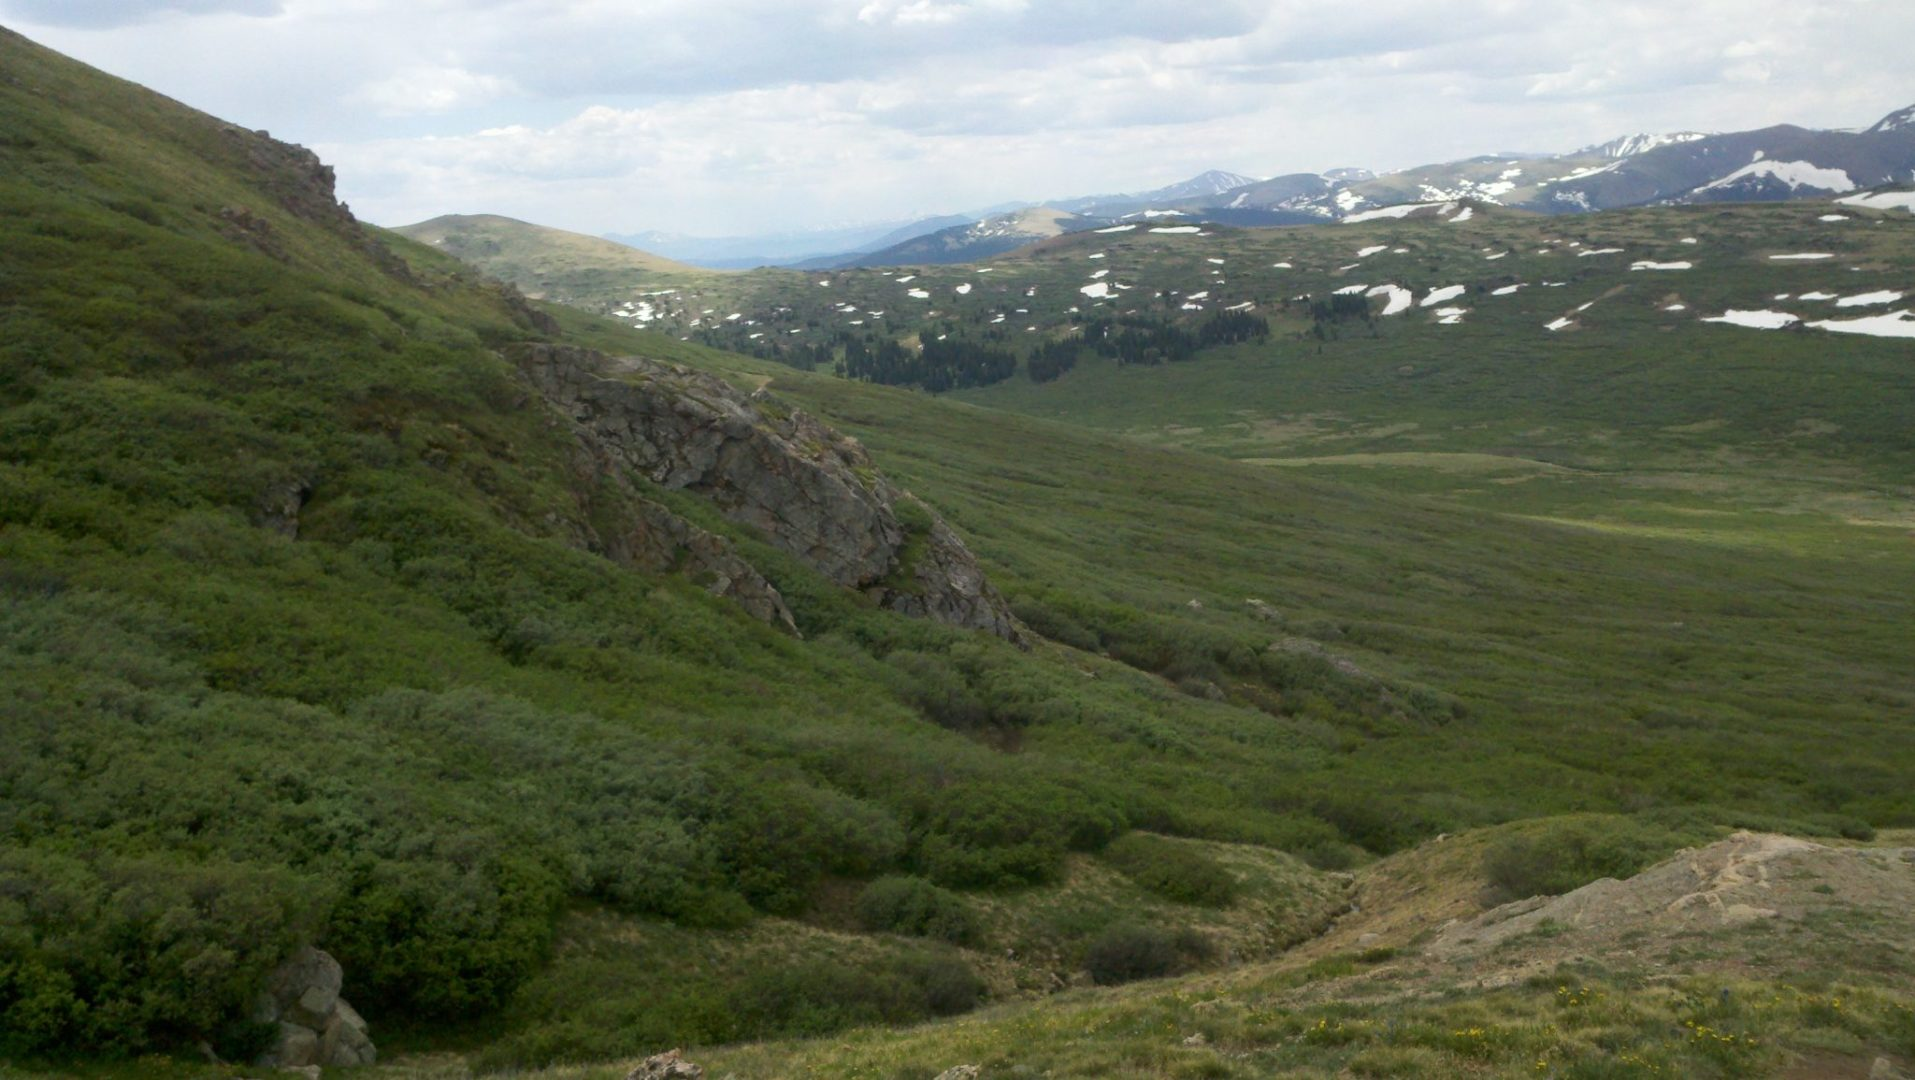 Guanella Pass area